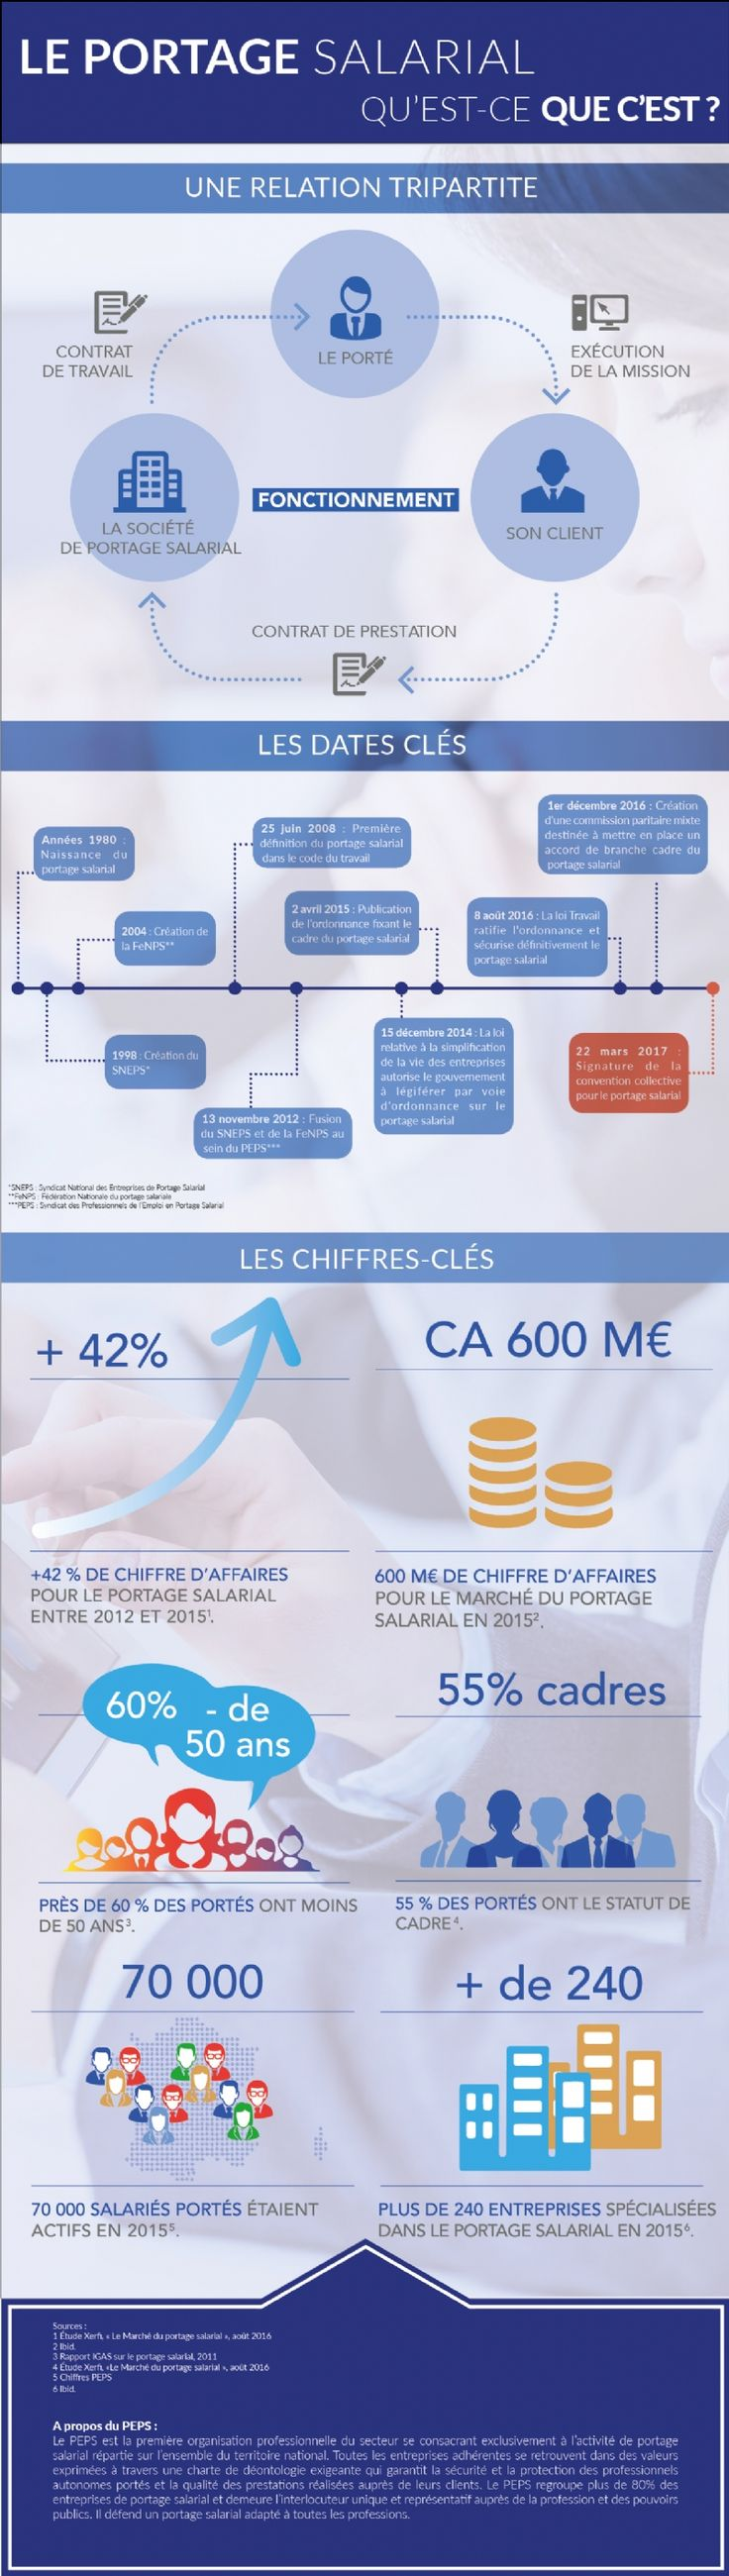 Le portage salarial expliqué en une infographie